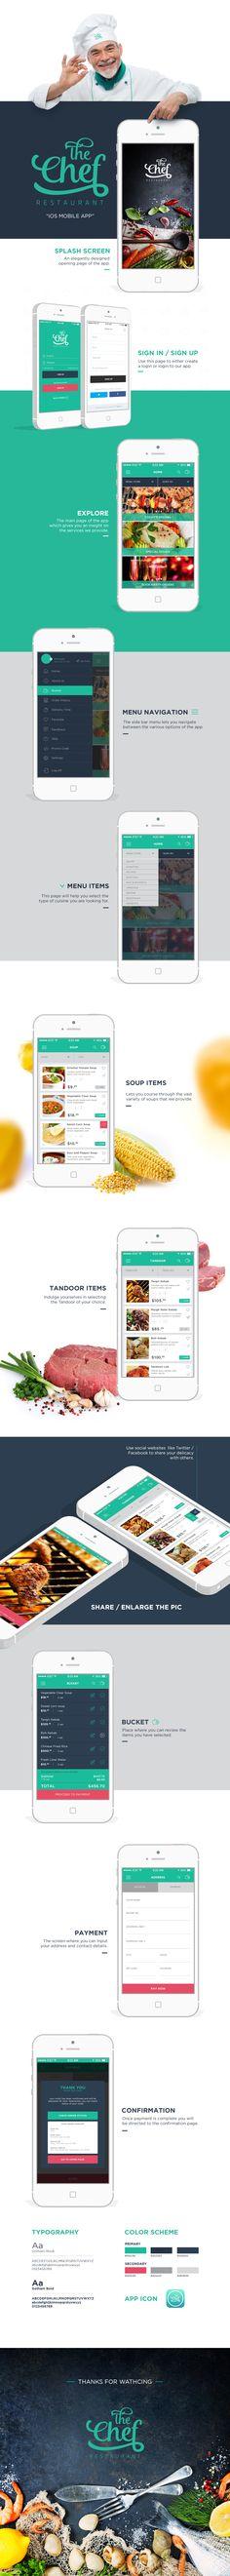 The Chef Restaurant iOS App on Behance #AFSolution #KaosCommunication